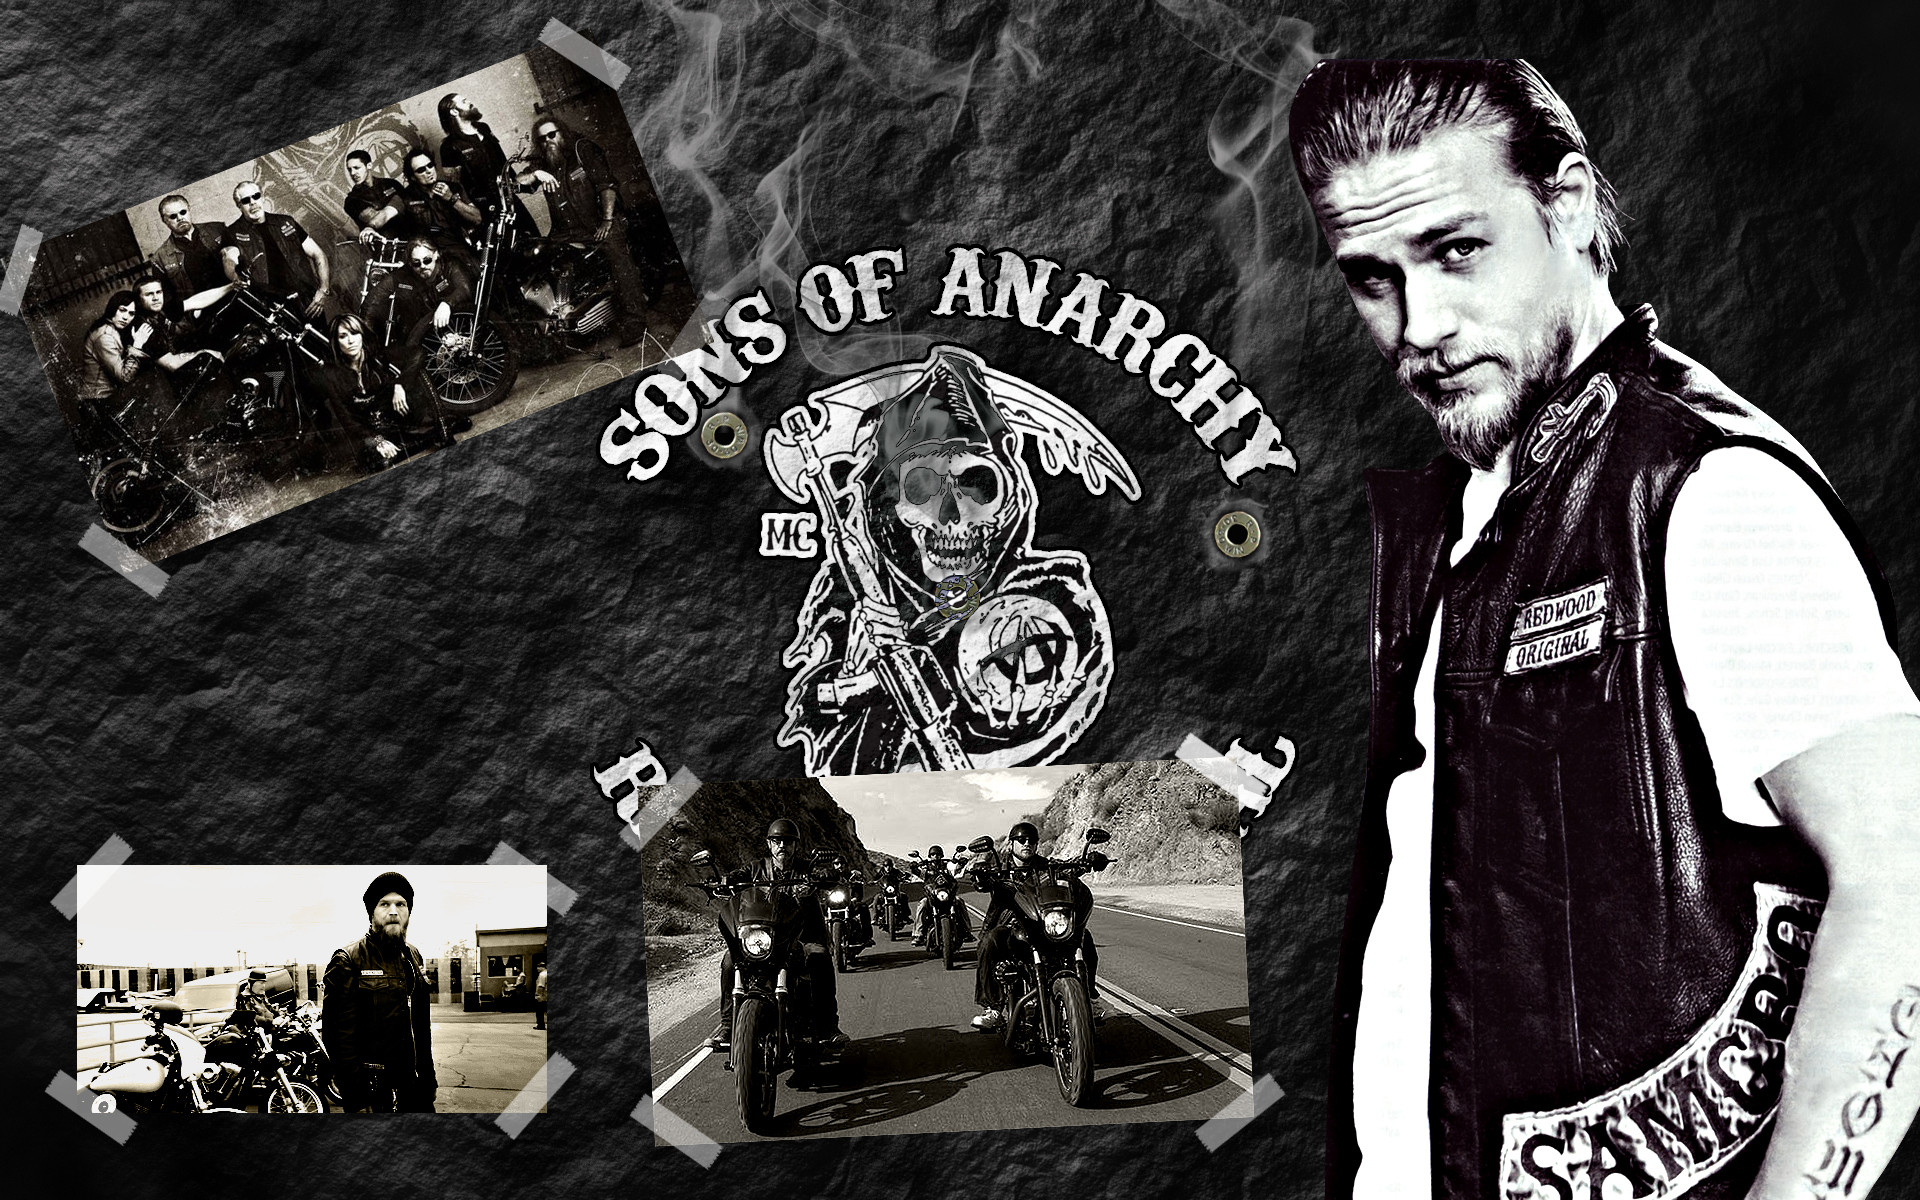 … Jax Teller – Sons of Anarchy